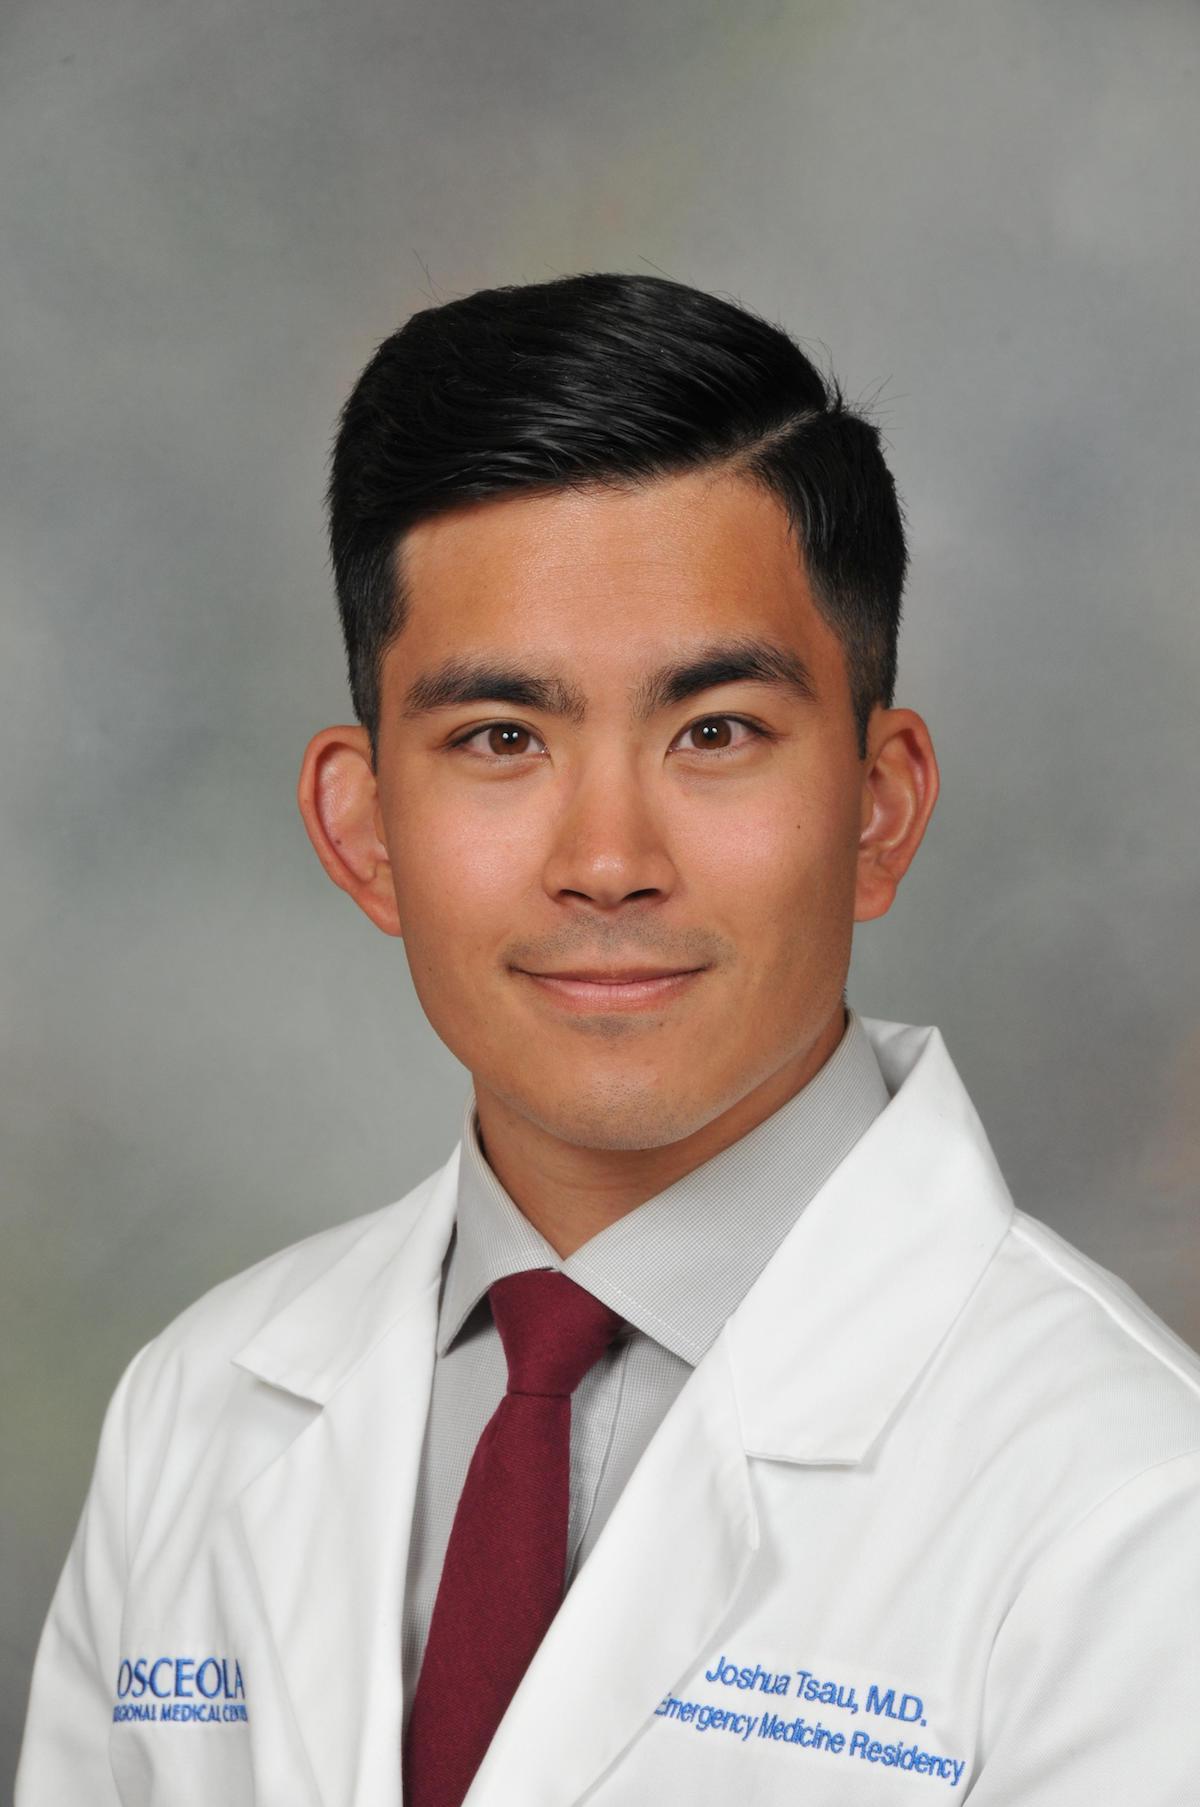 Joshua Tsau, M.D.